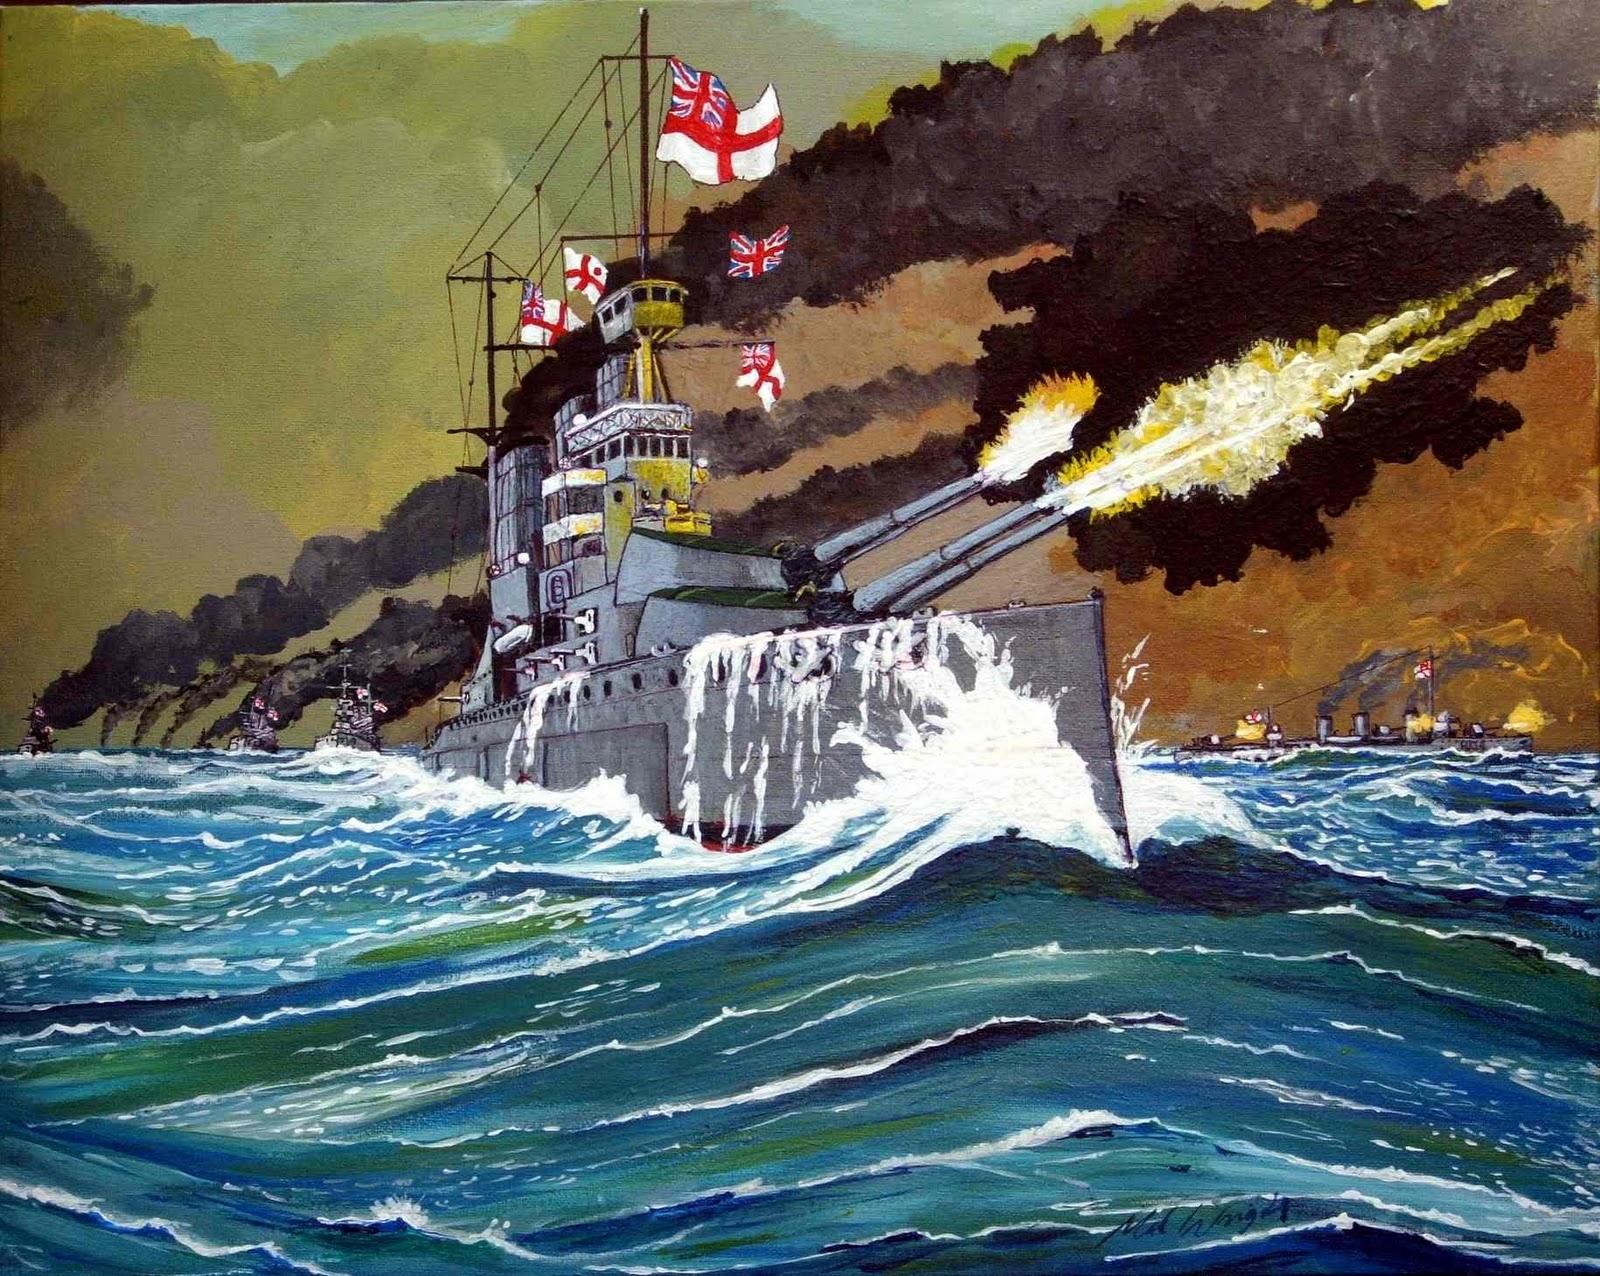 Mal U0026 39 S Blog  Battle Of Jutland